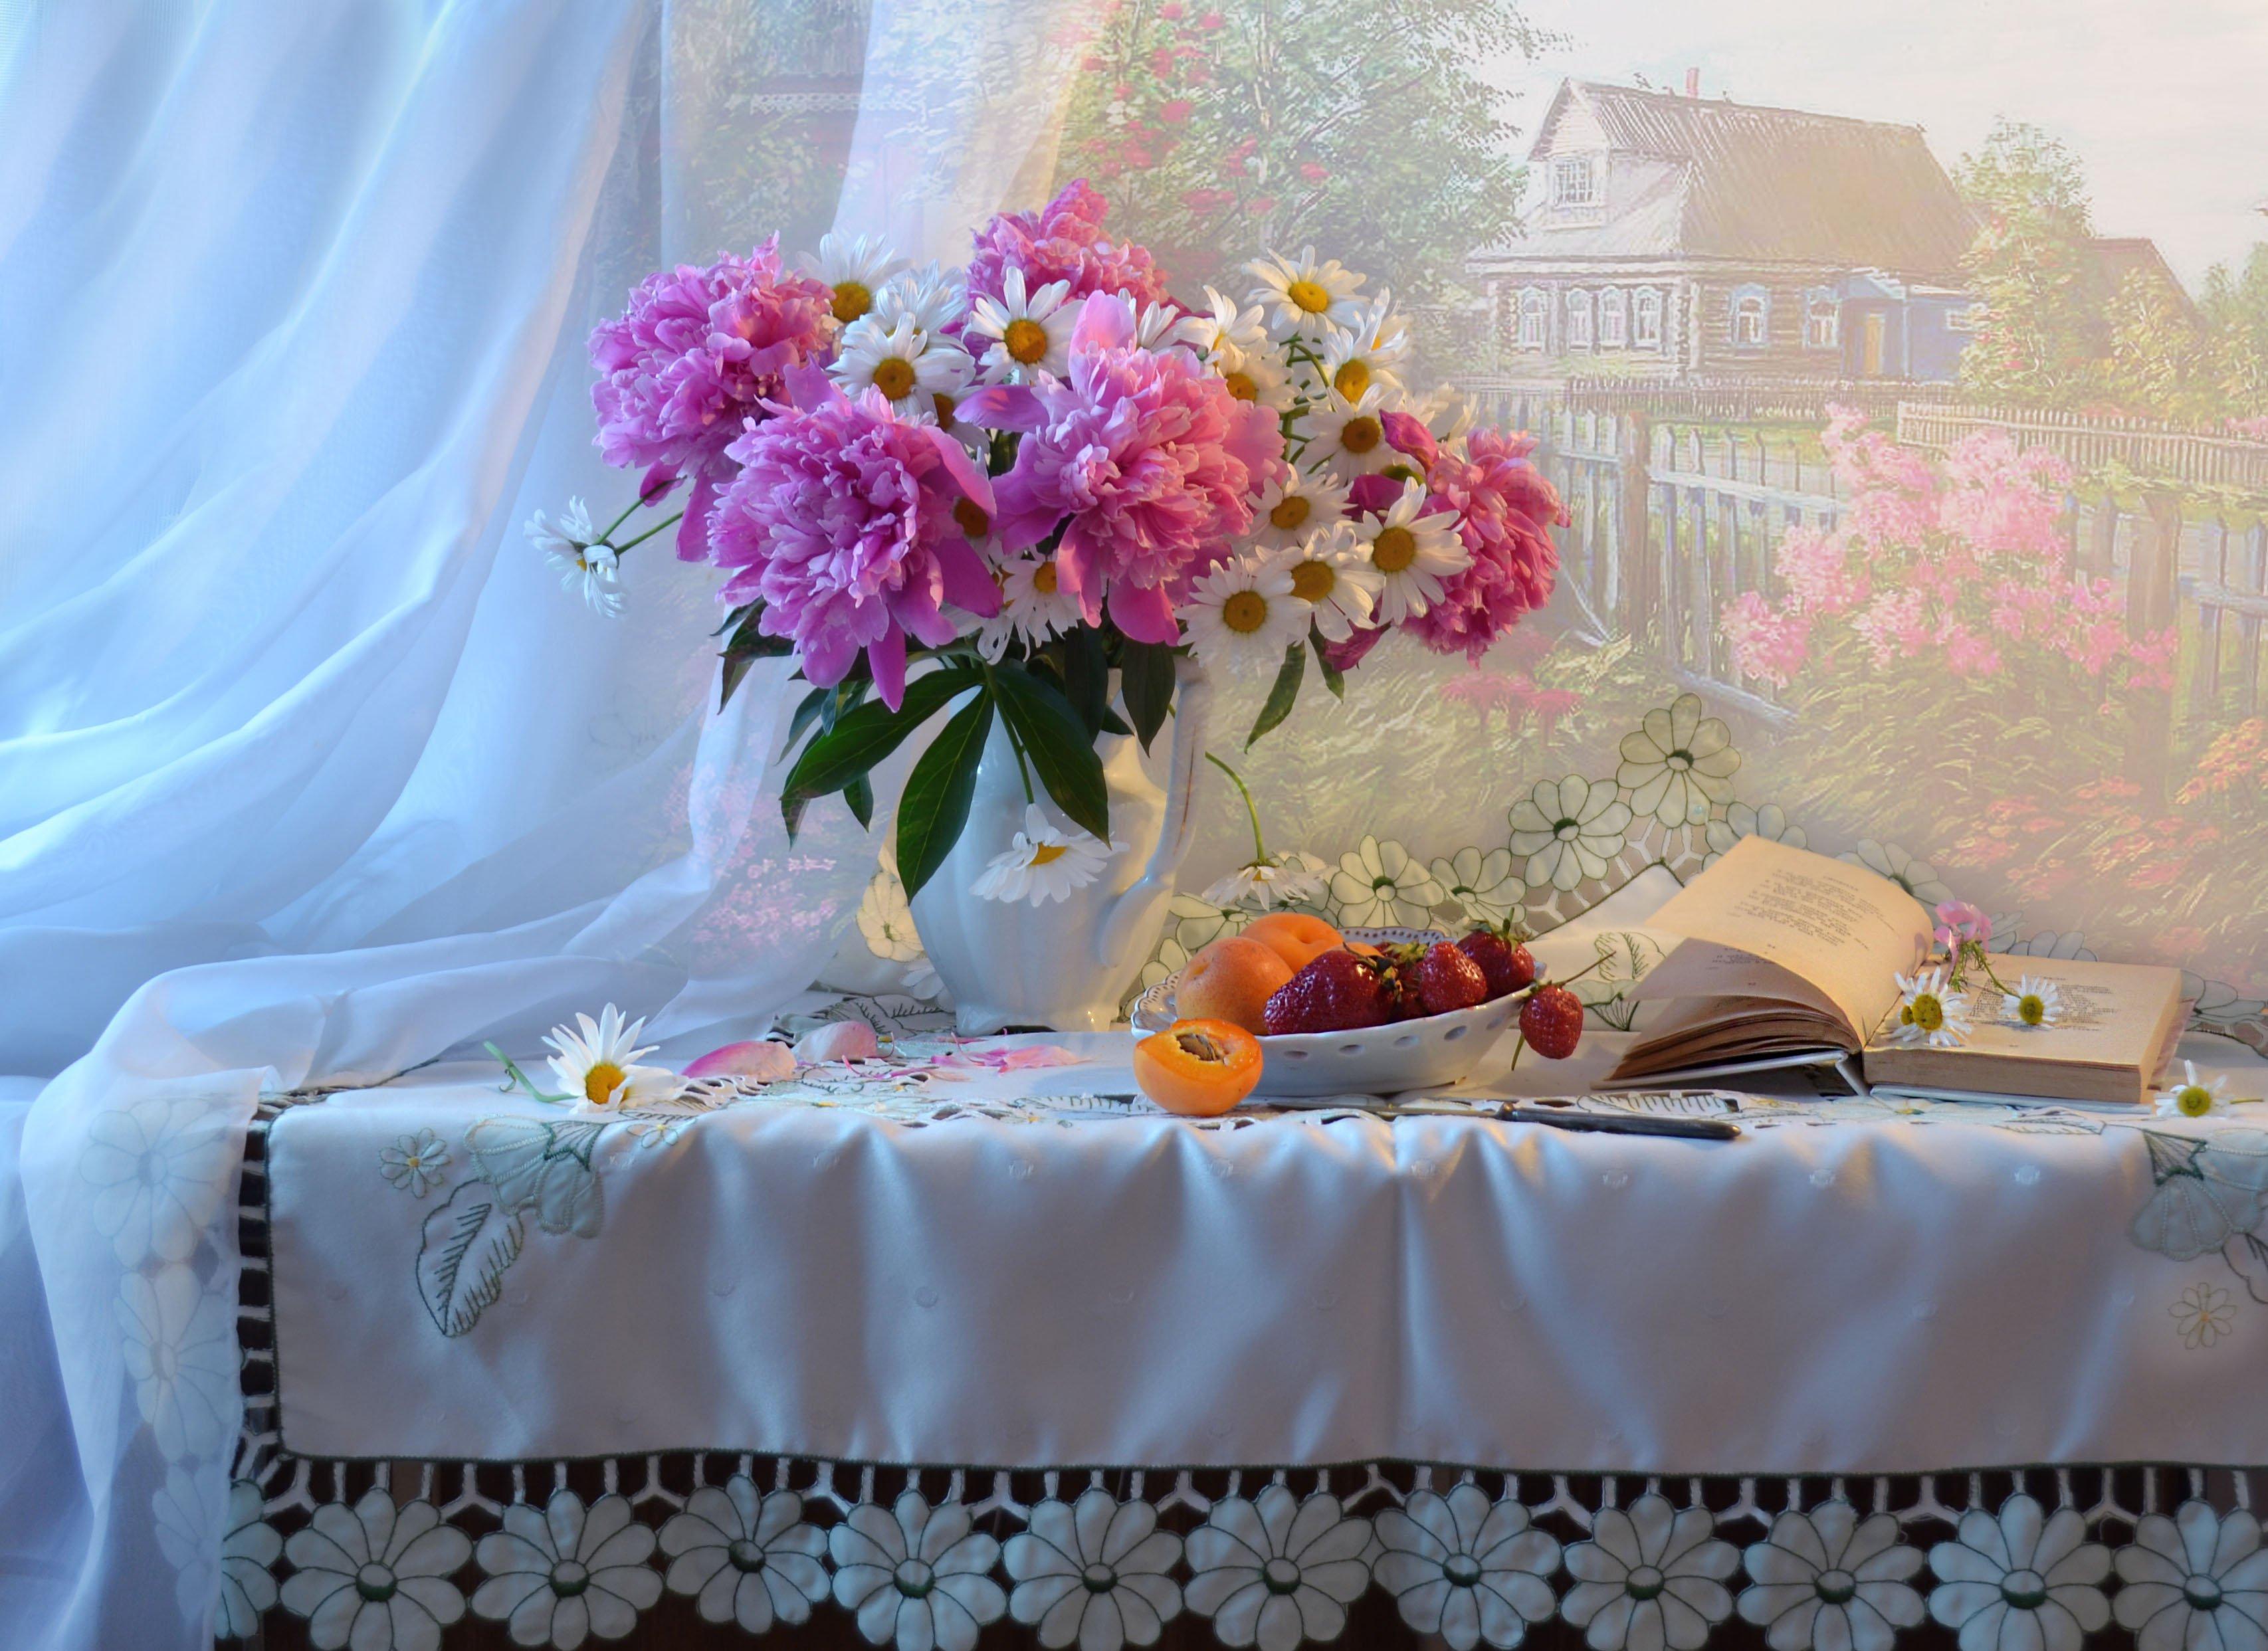 still life, натюрморт,цветы, фото натюрморт, ромашки, пионы, лето, книга, клубника, август, абрикосы, Колова Валентина